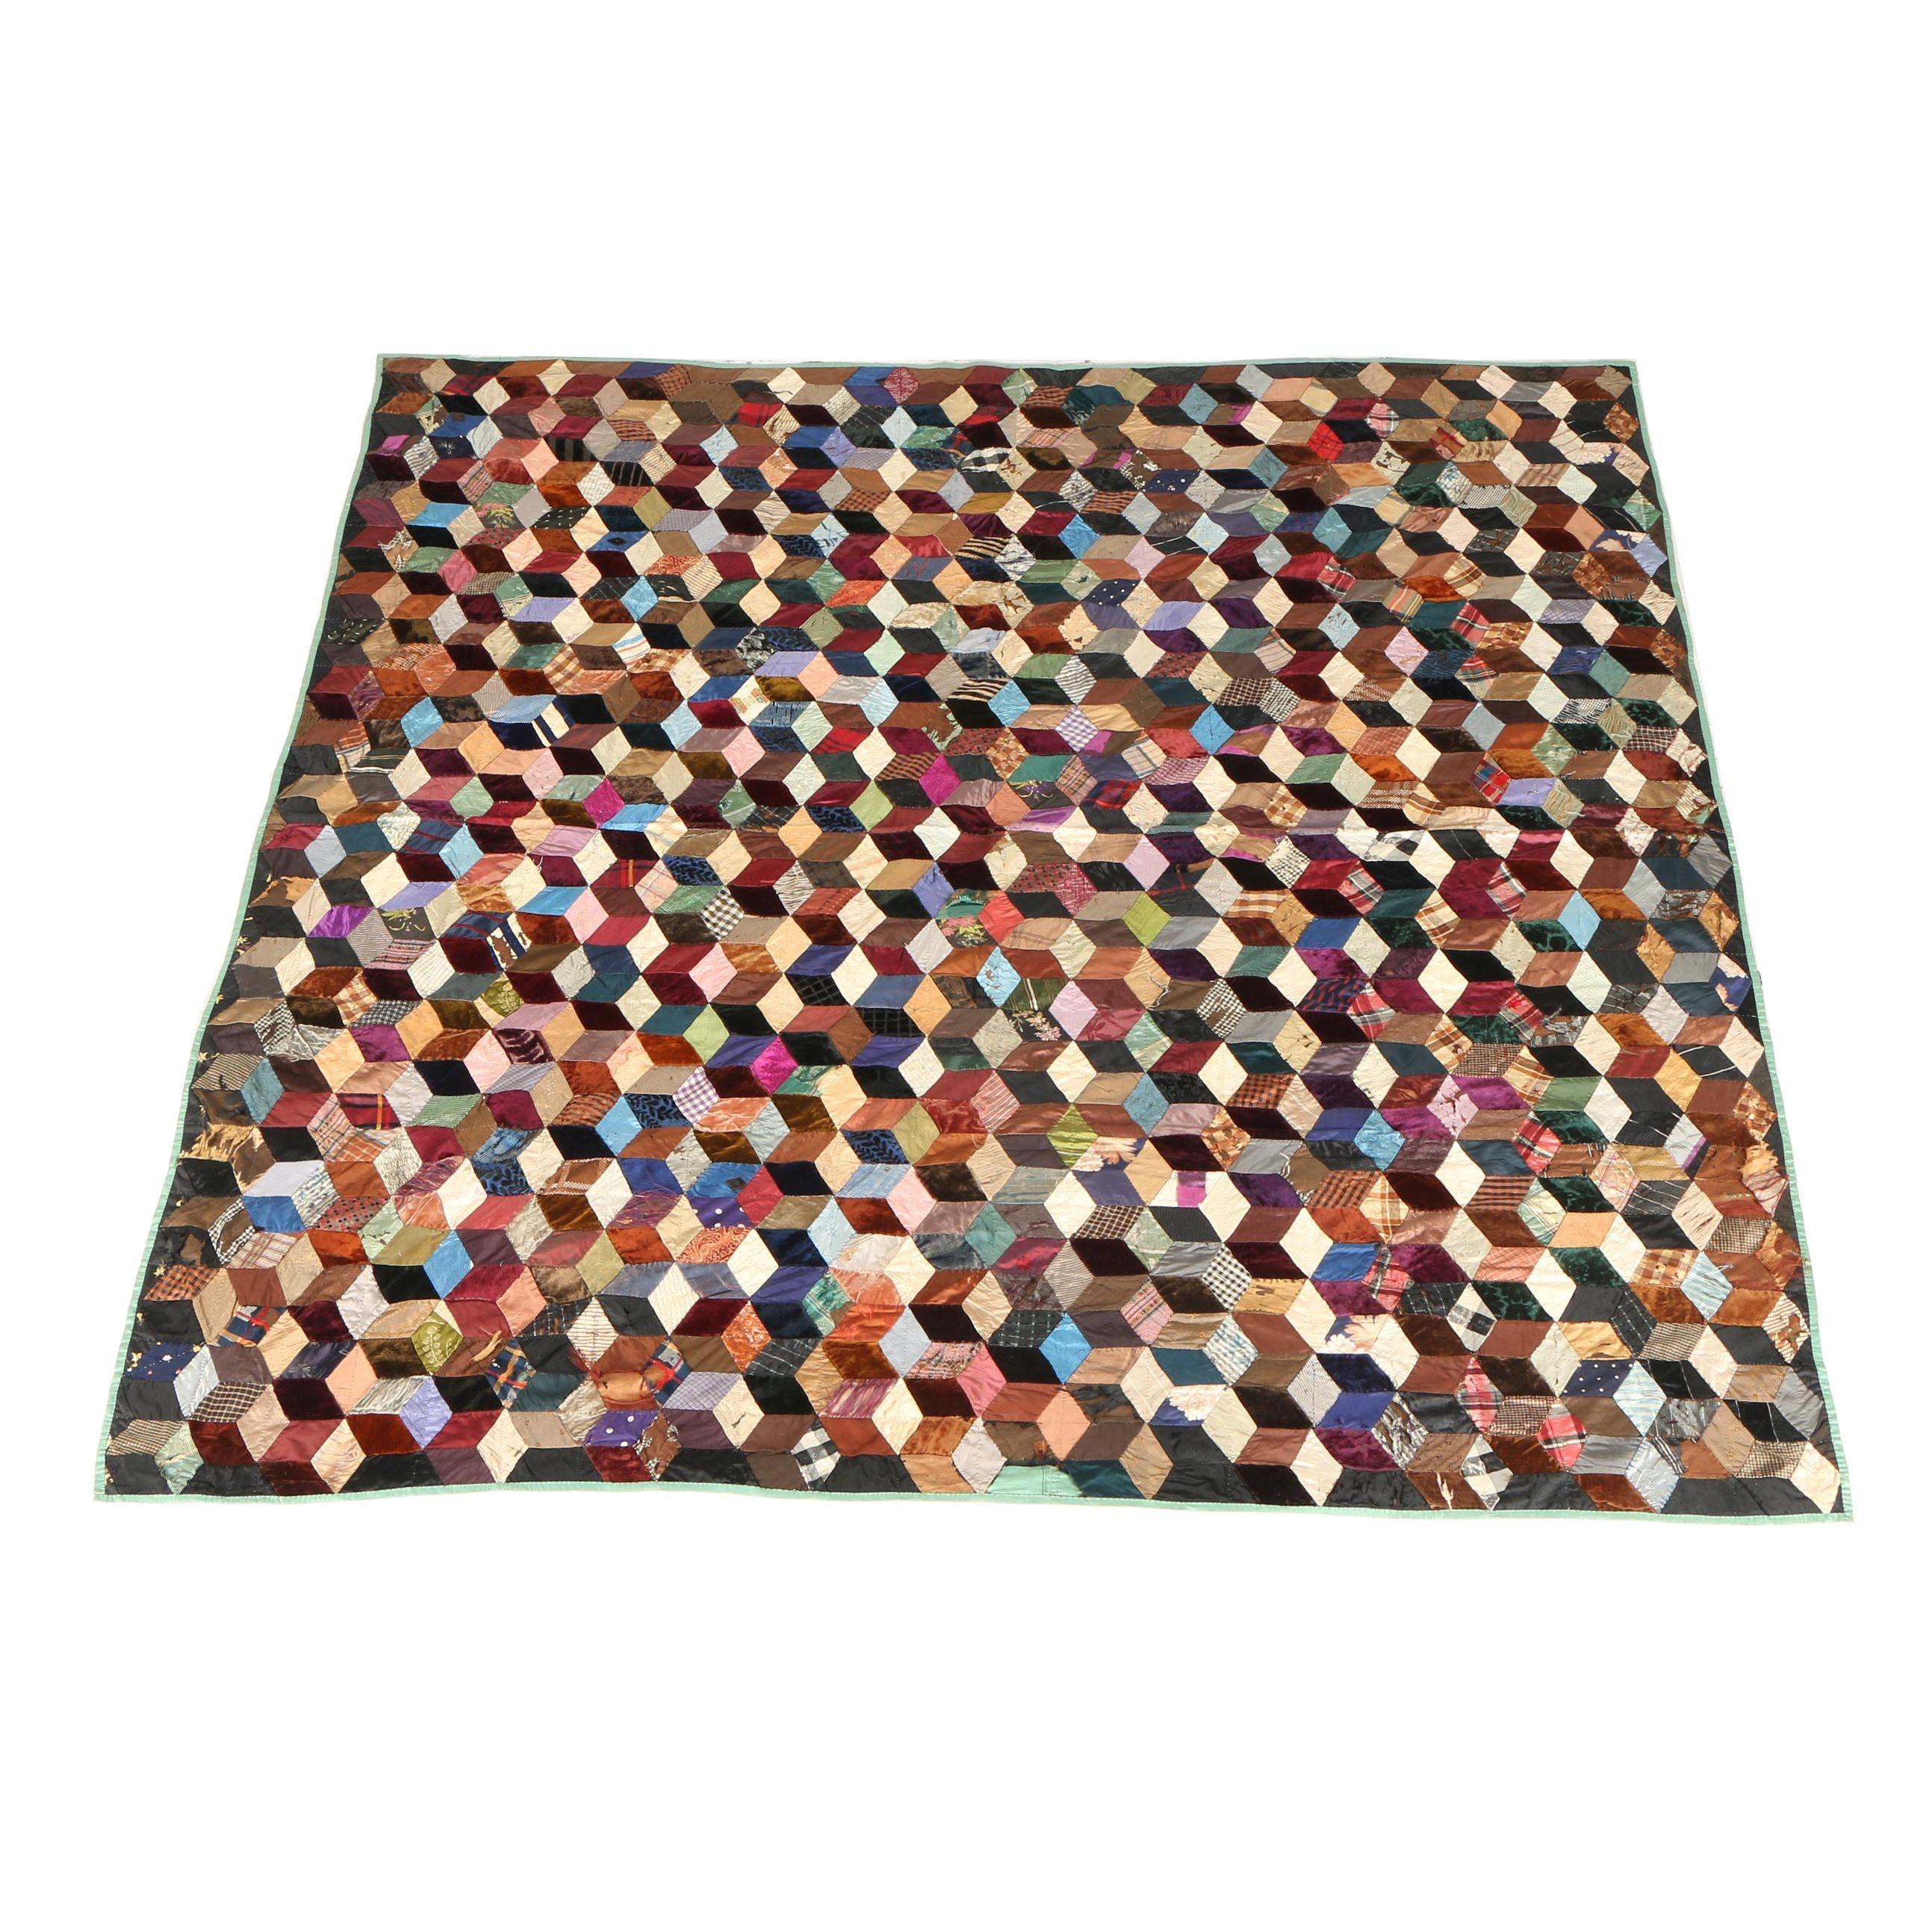 Handmade Tumbling Block Quilt